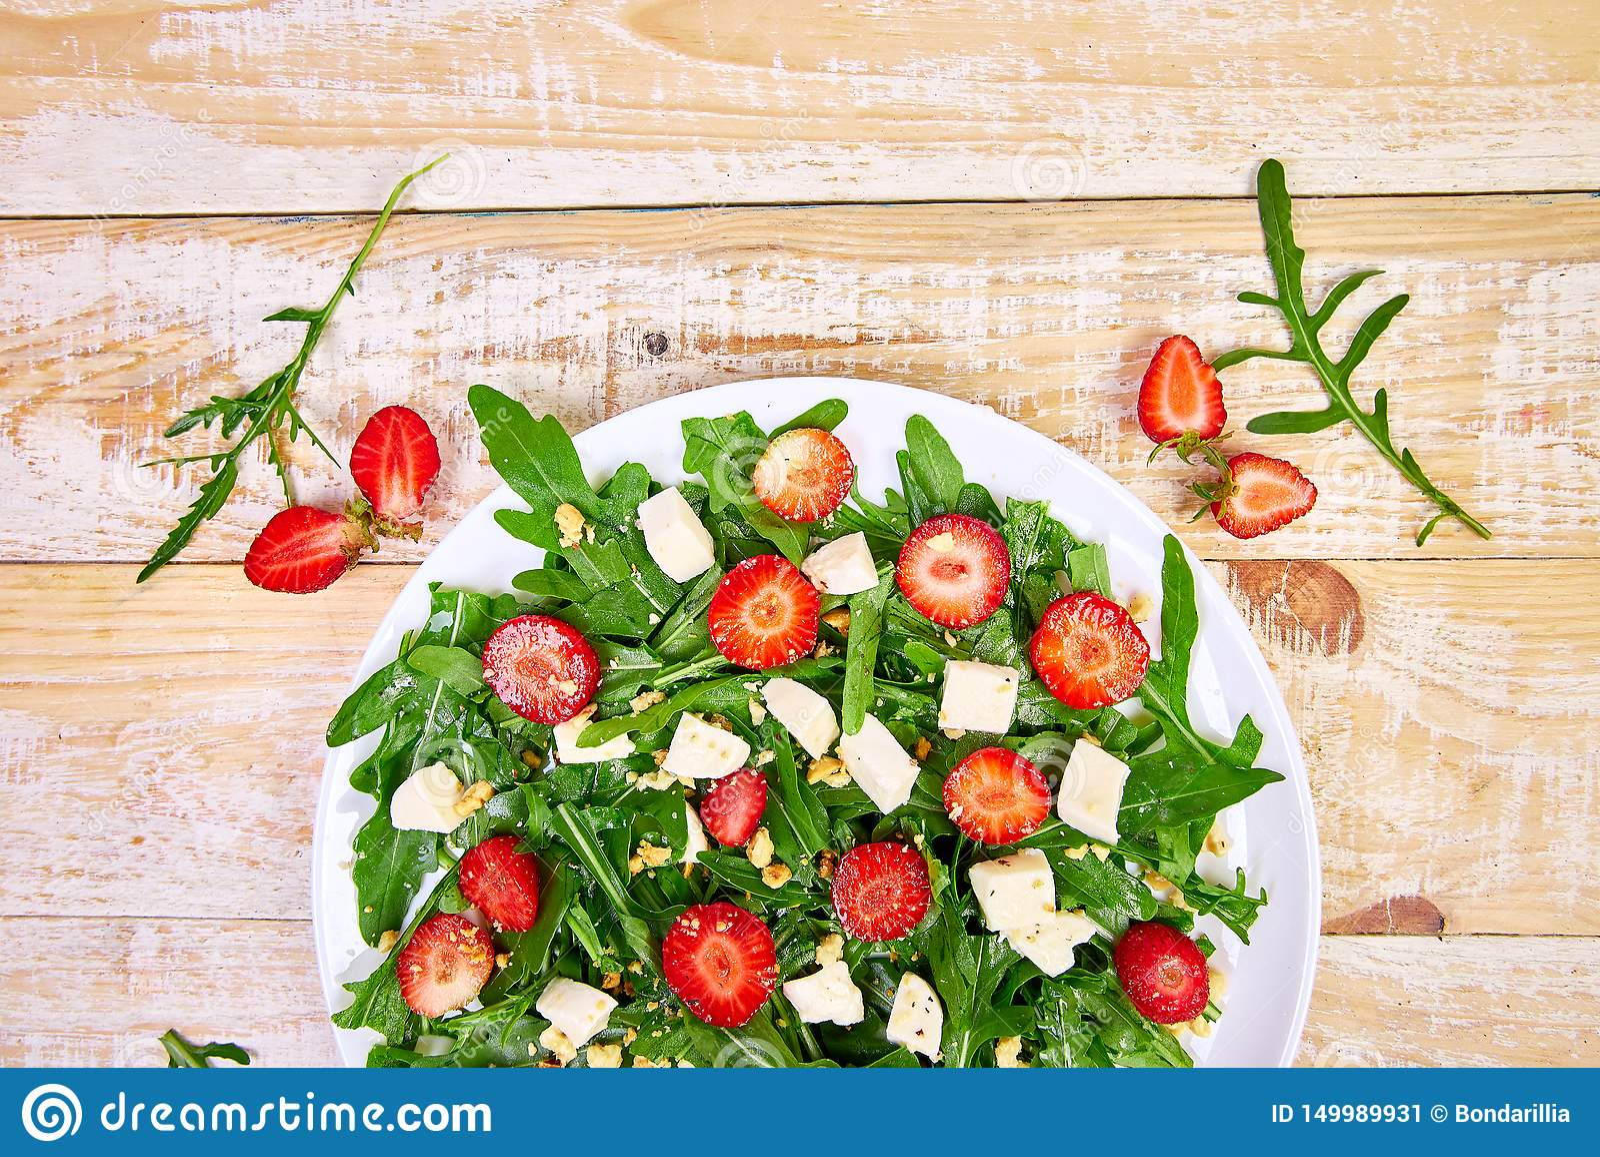 Fresh salad with arugula, strawberries, feta cheese and nuts